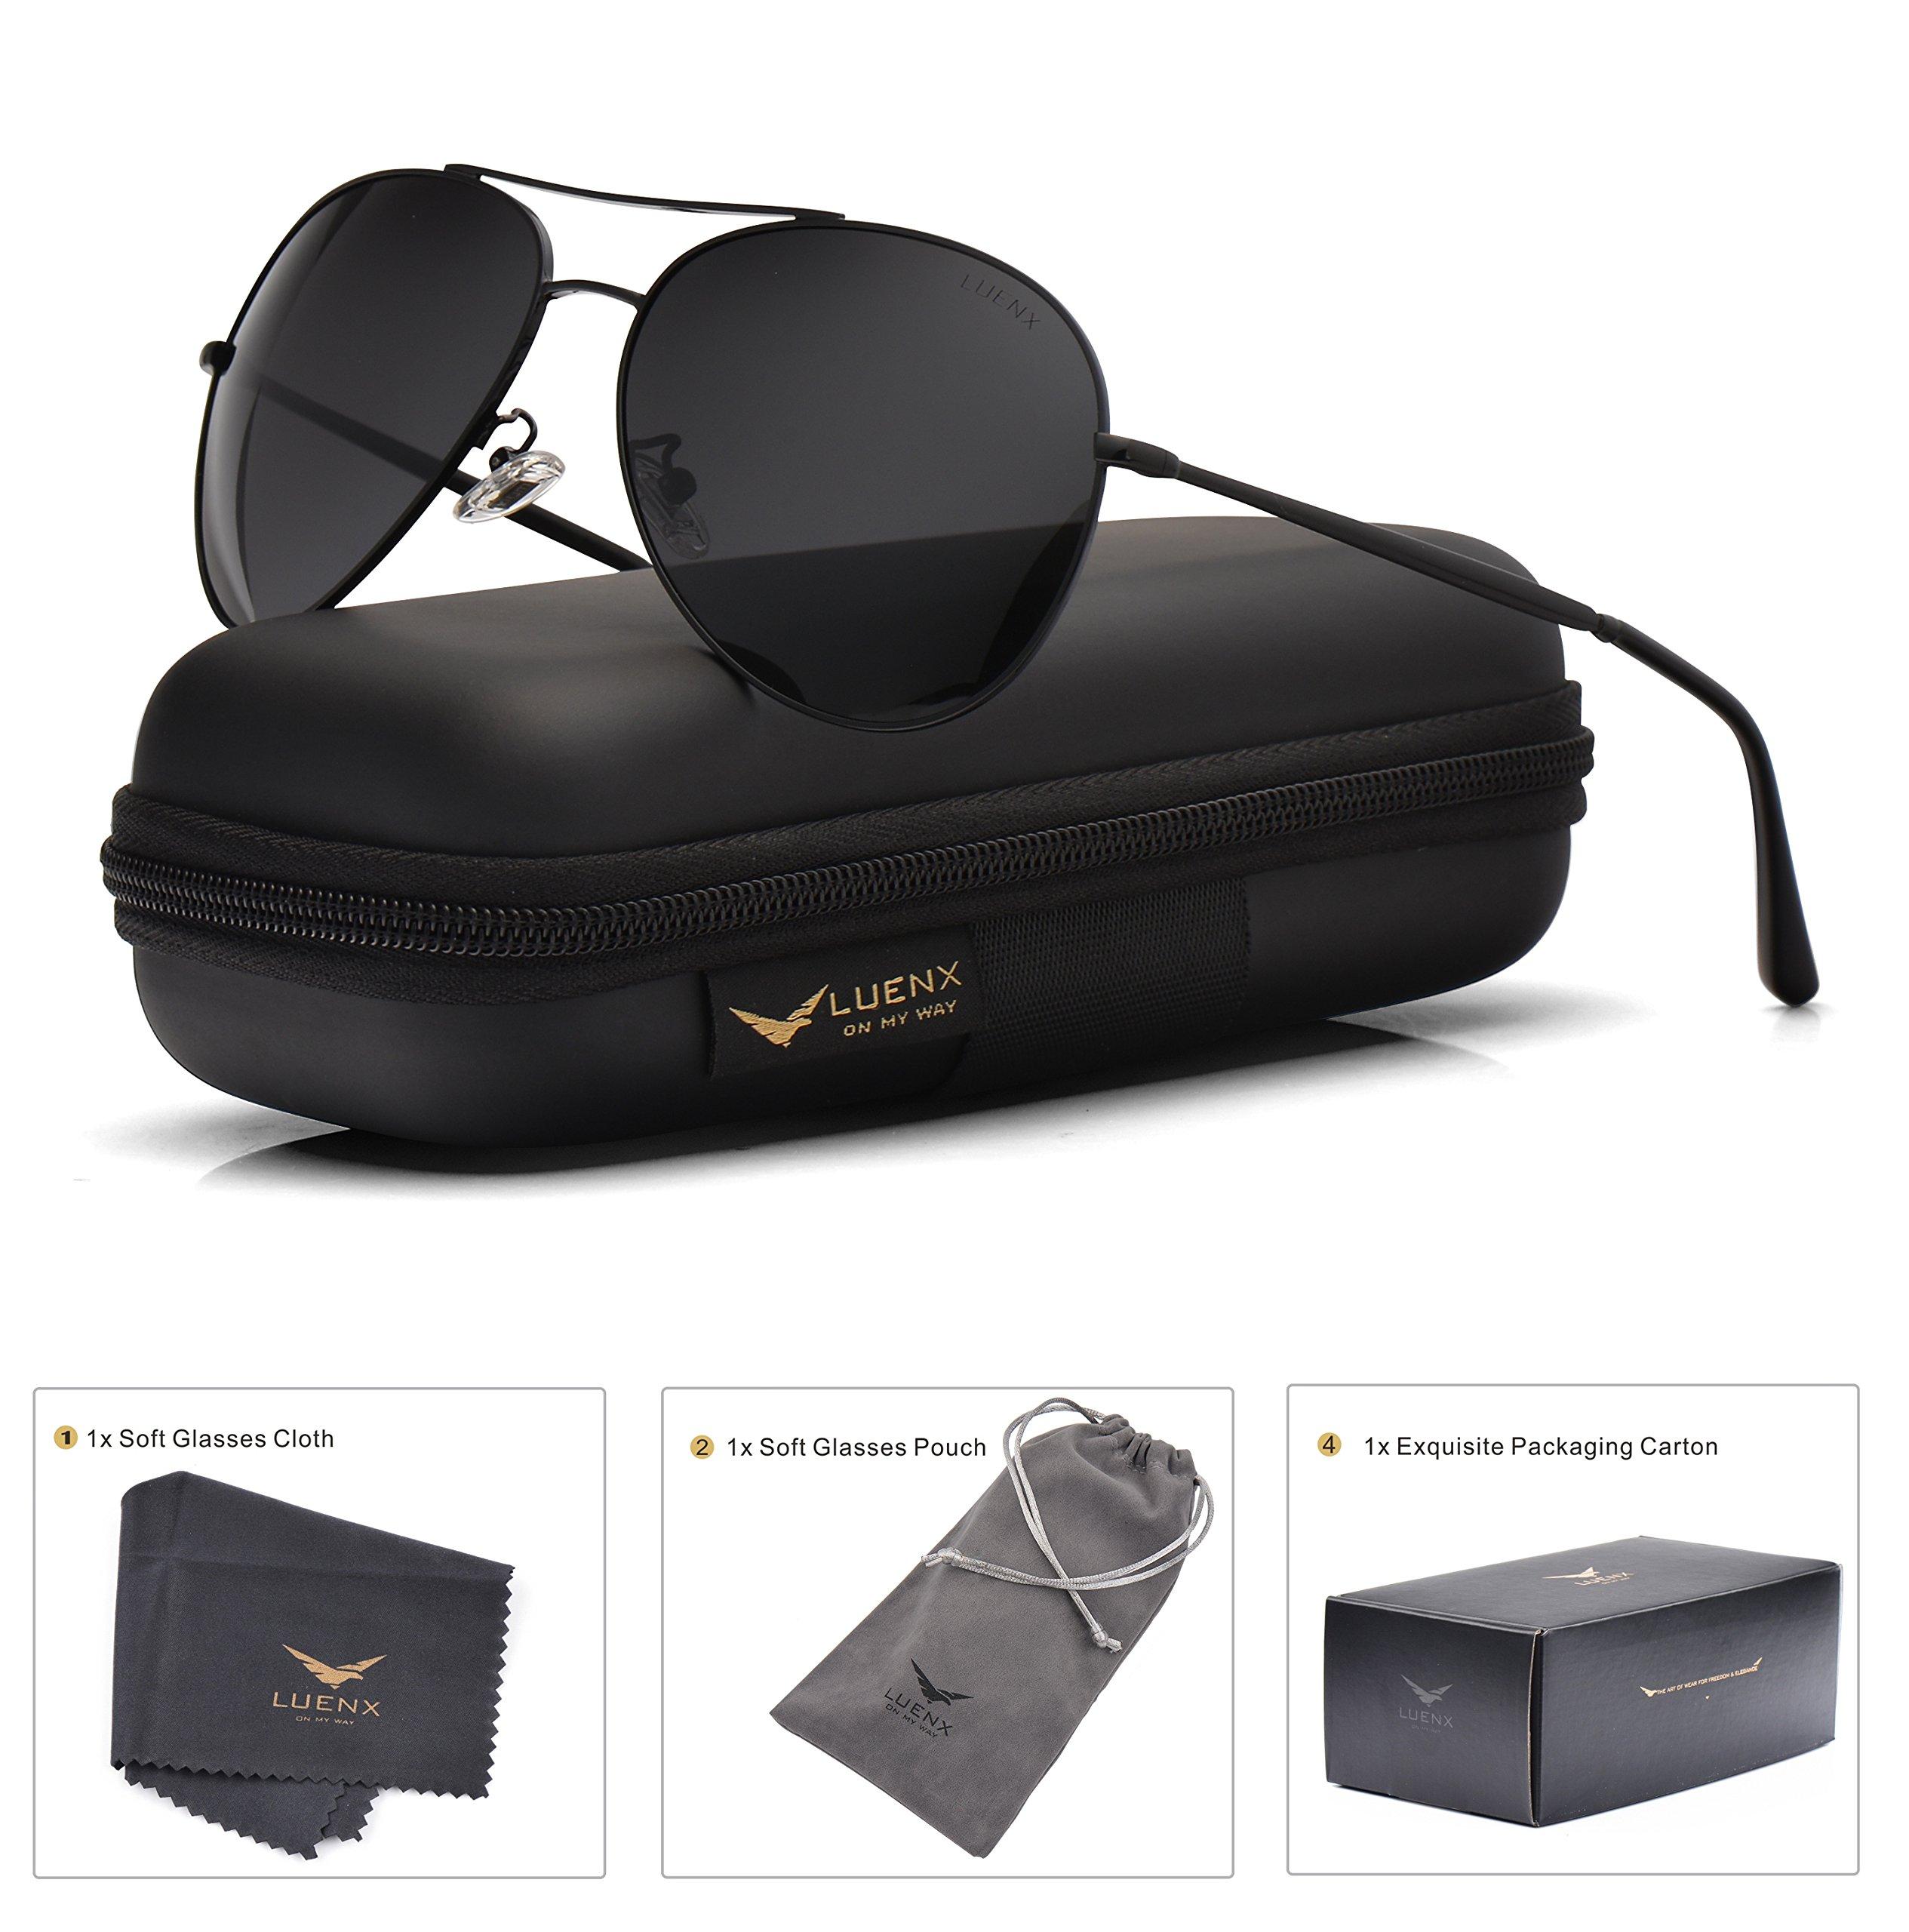 LUENX Aviator Sunglasses Men Women Non-Mirror Polarized UV400 Metal Frame 60MM (9-Black, 60)